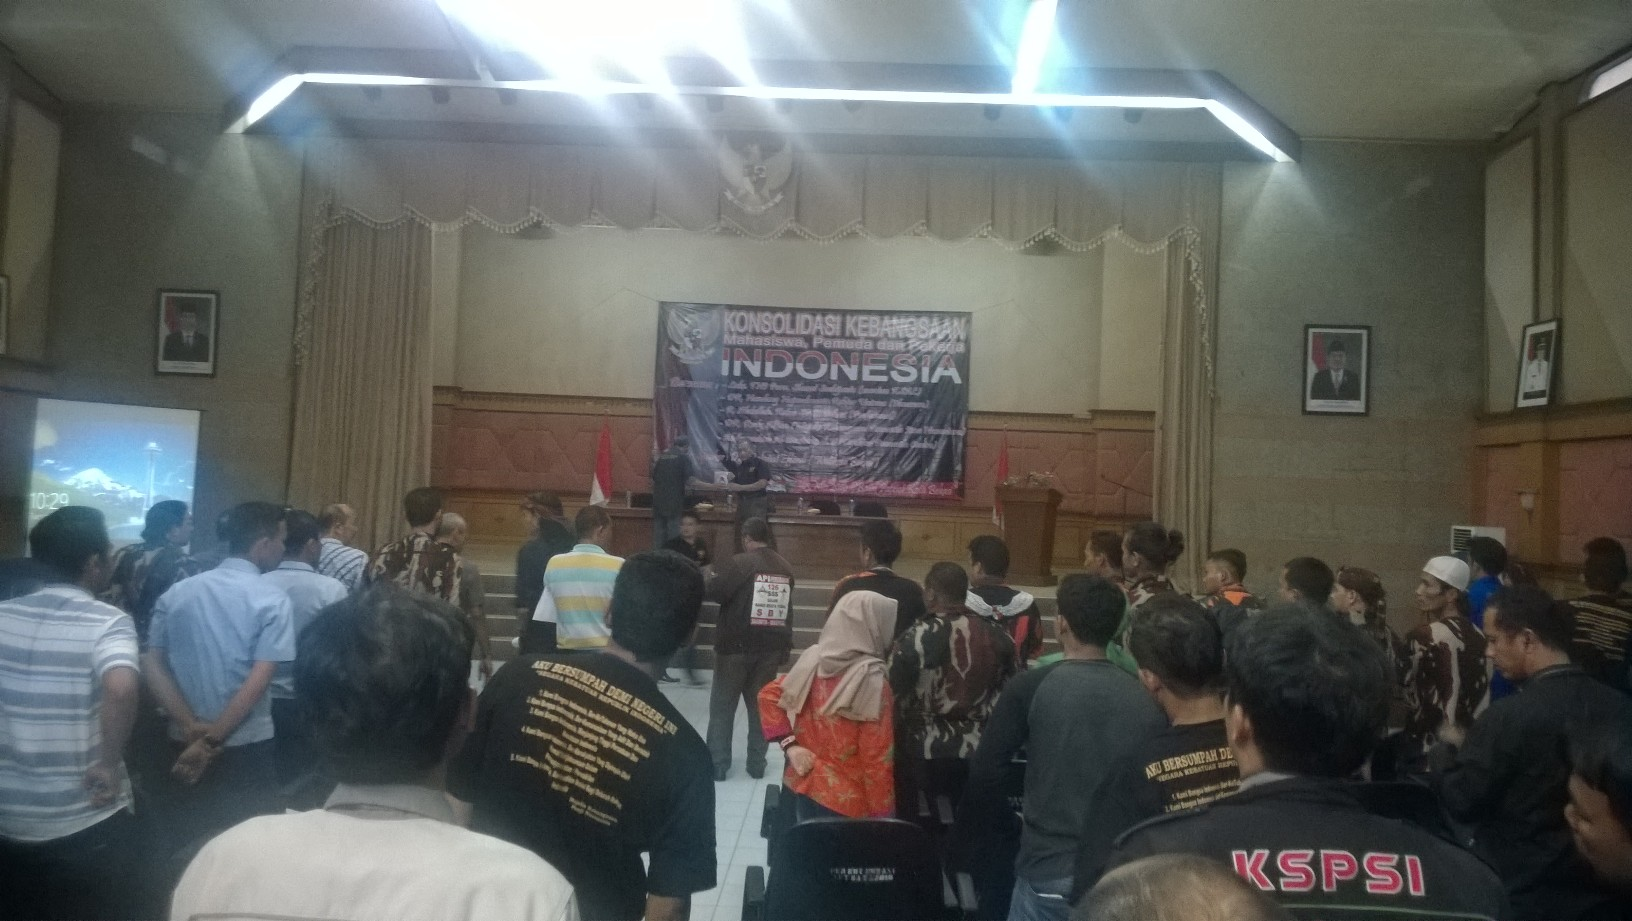 Pancasila Sebagai Nilai Kebenaran Asli Bangsa Indonesia, Sekarang Sudah Berubah Menjadi Bangsa Materialistis dan Tidak Beradab